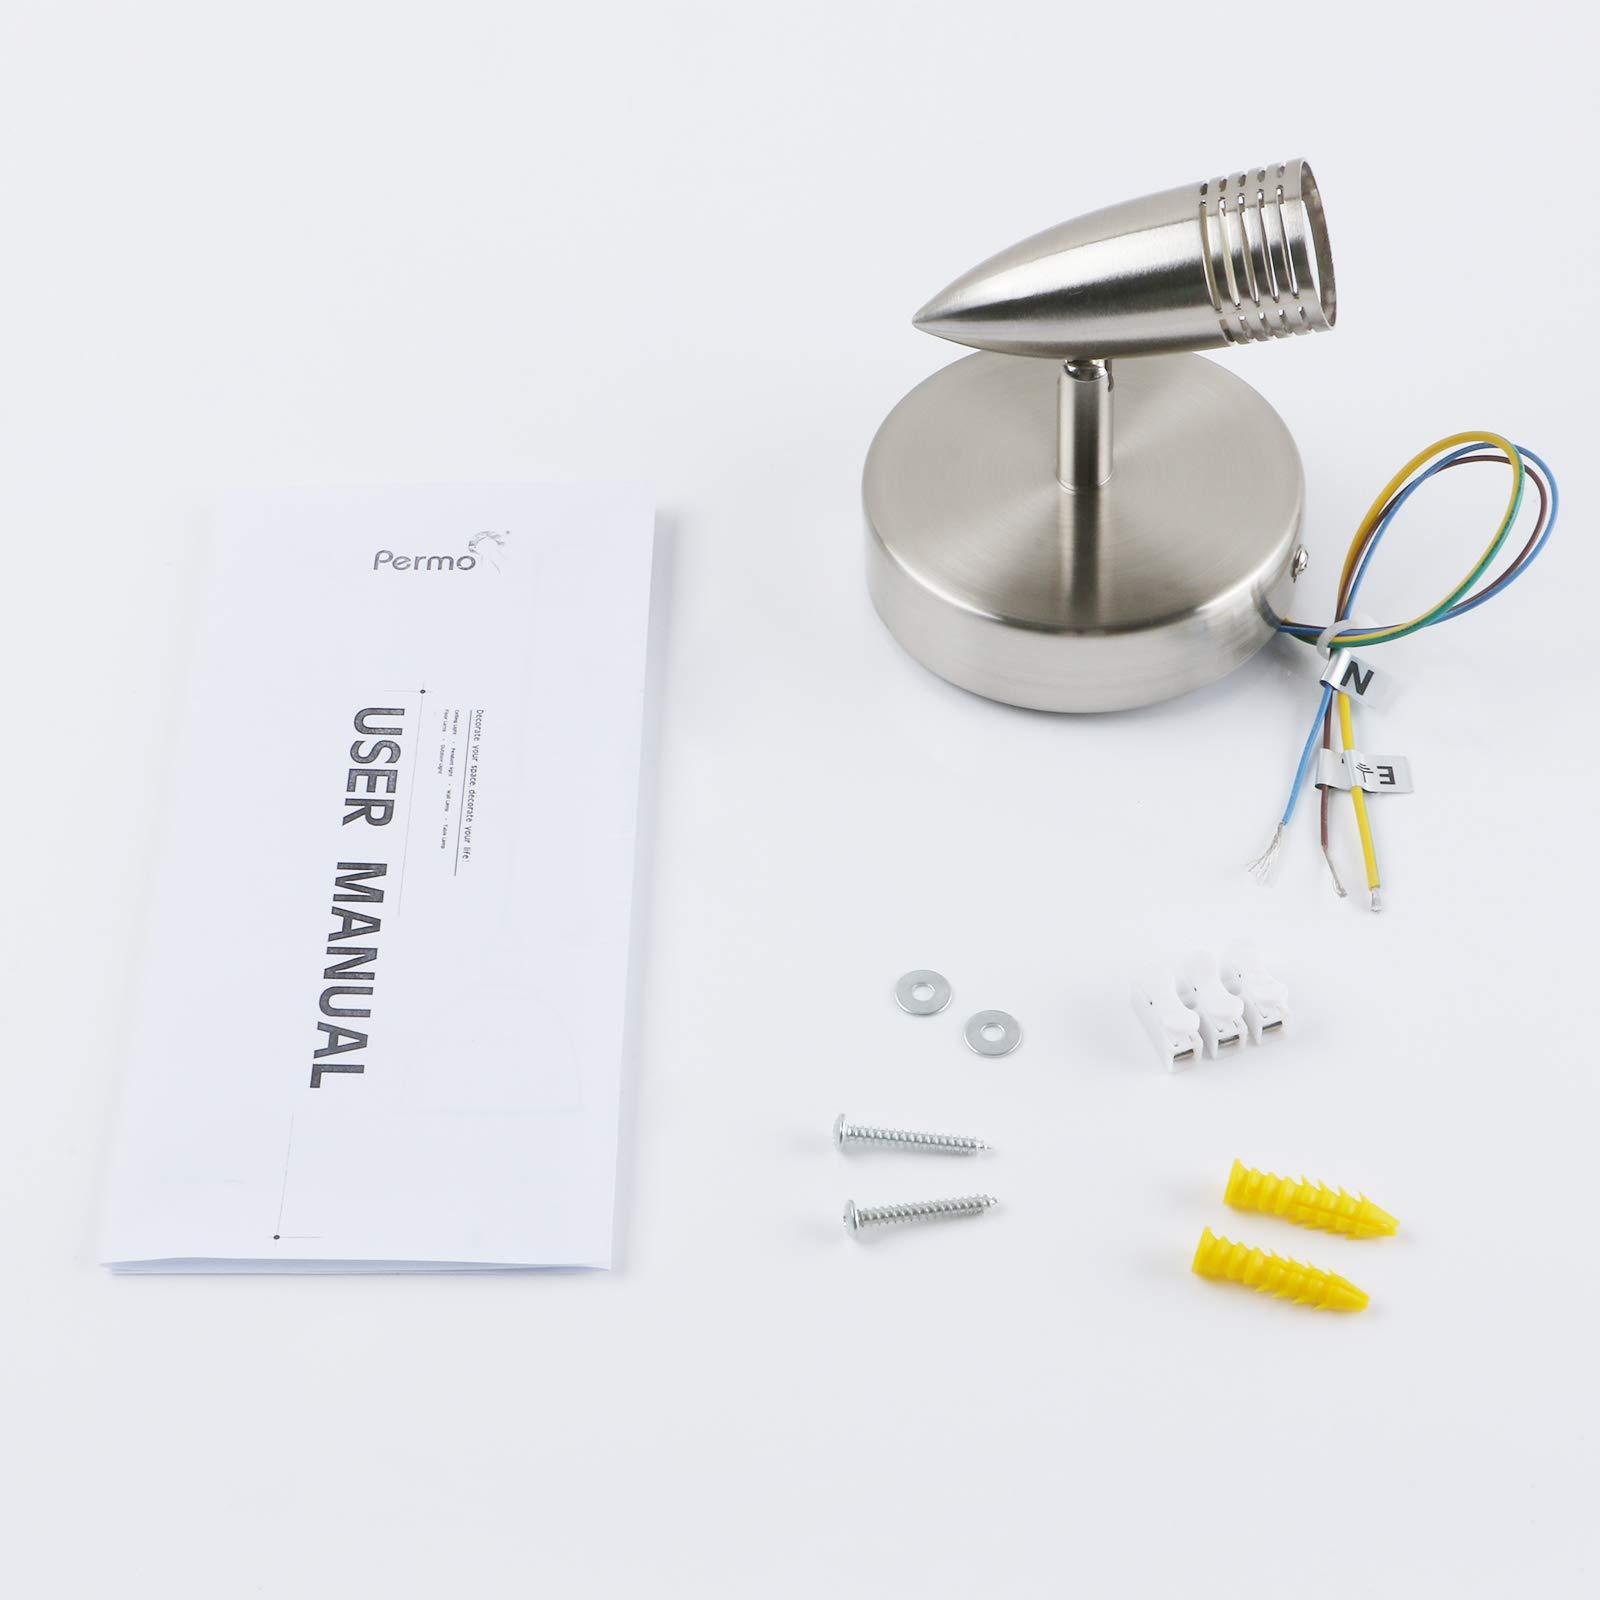 LED Ceiling Spot Light, Yosoan Brushed Portable Modern Mini Spotlight Adjustable Bullet Lamp for Mall Bar Coffee Bathroom Dressing Room Hallway (2-Head)